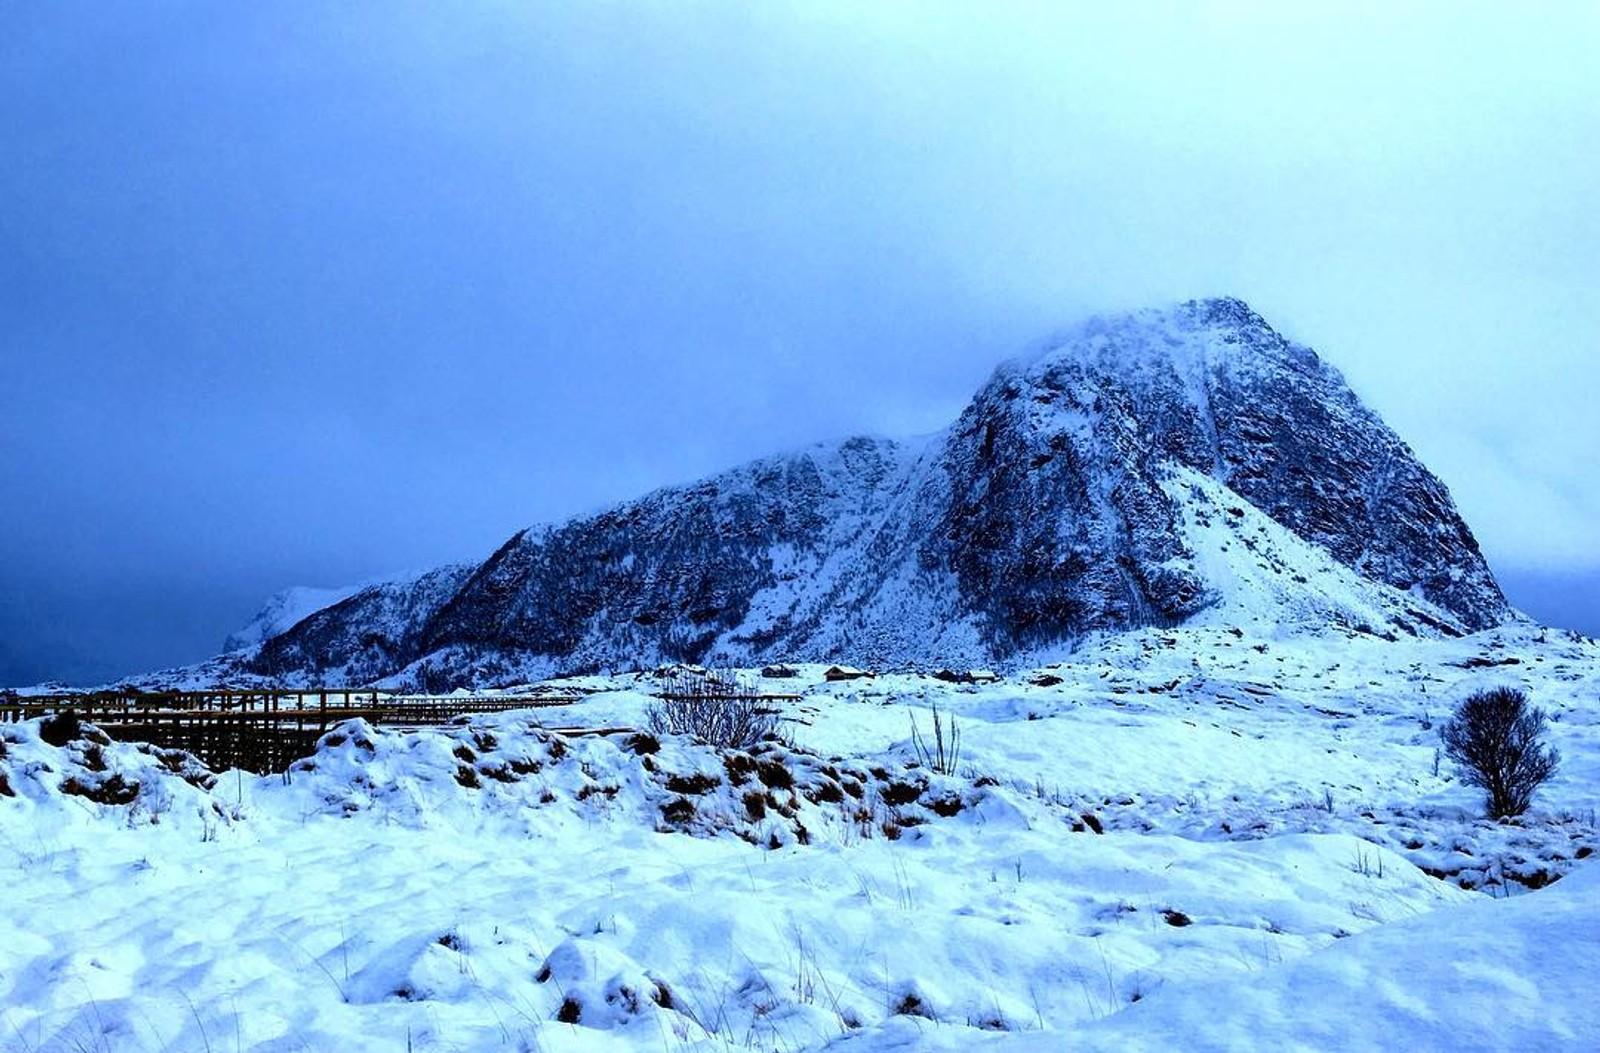 Hoven i vinterljos. Teken på Hovsund i Lofoten.